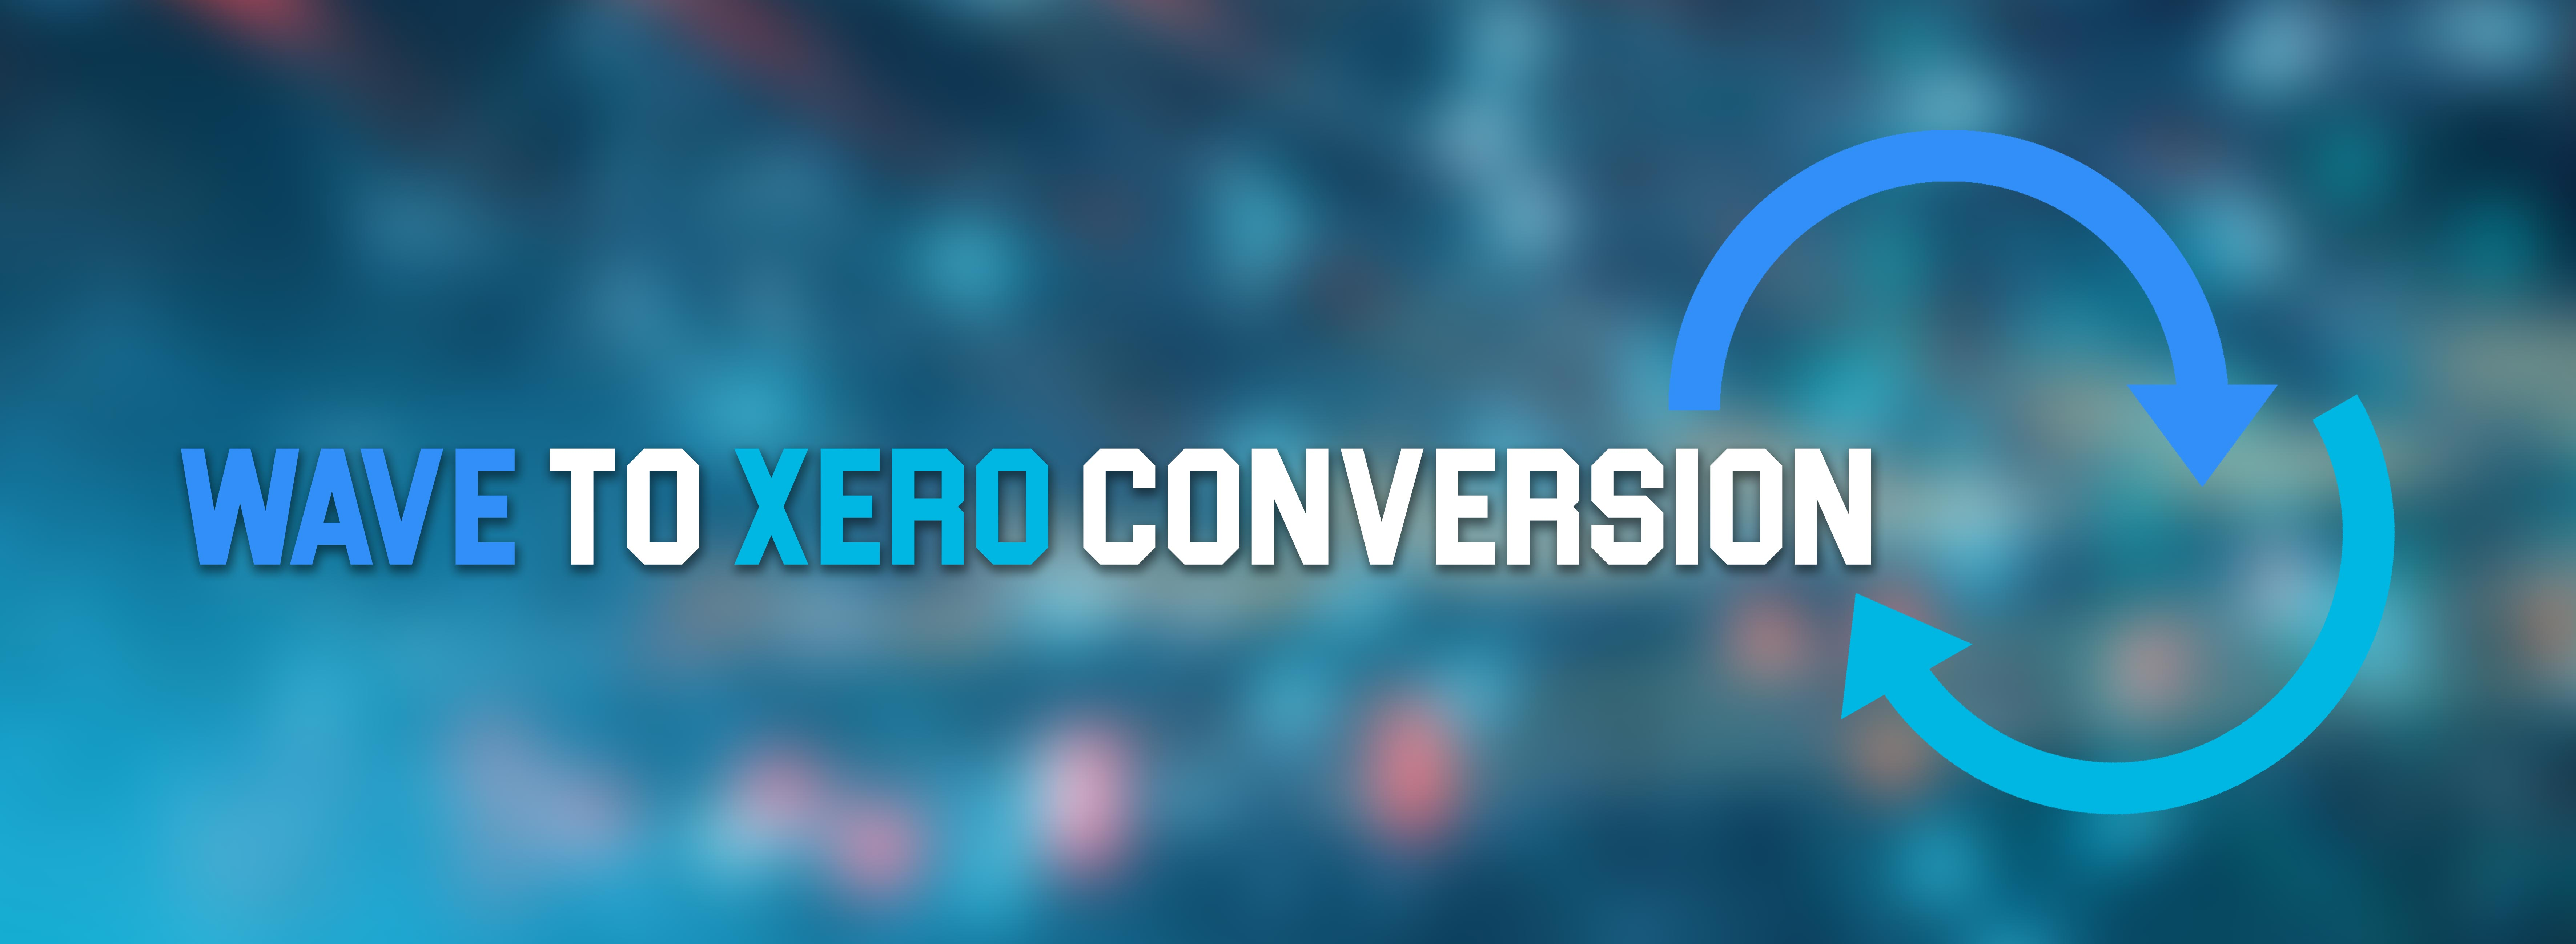 Wave To Xero Conversion